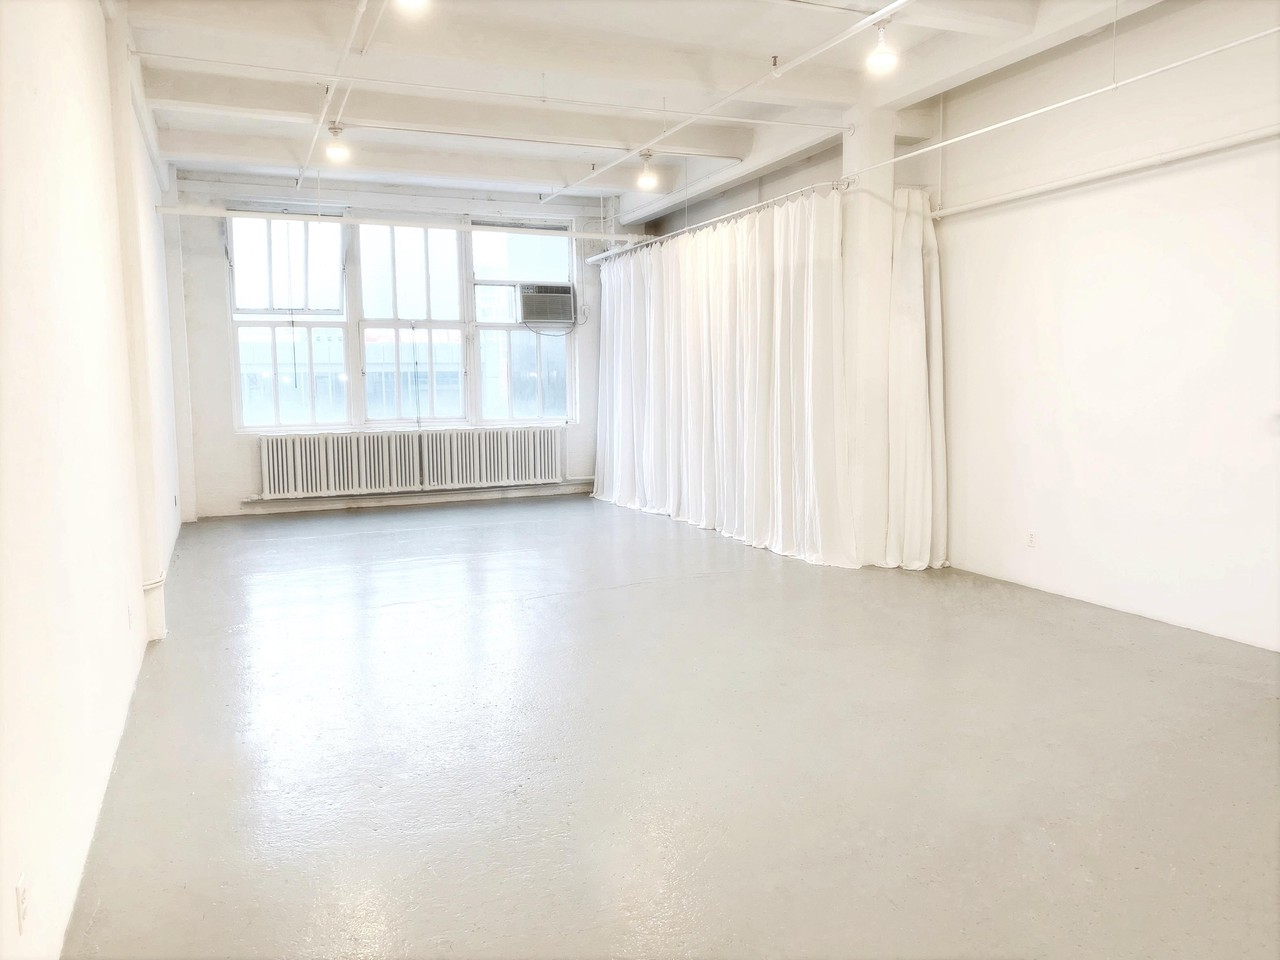 NYC workshop spaces Gallery West Chelsea Space image 5